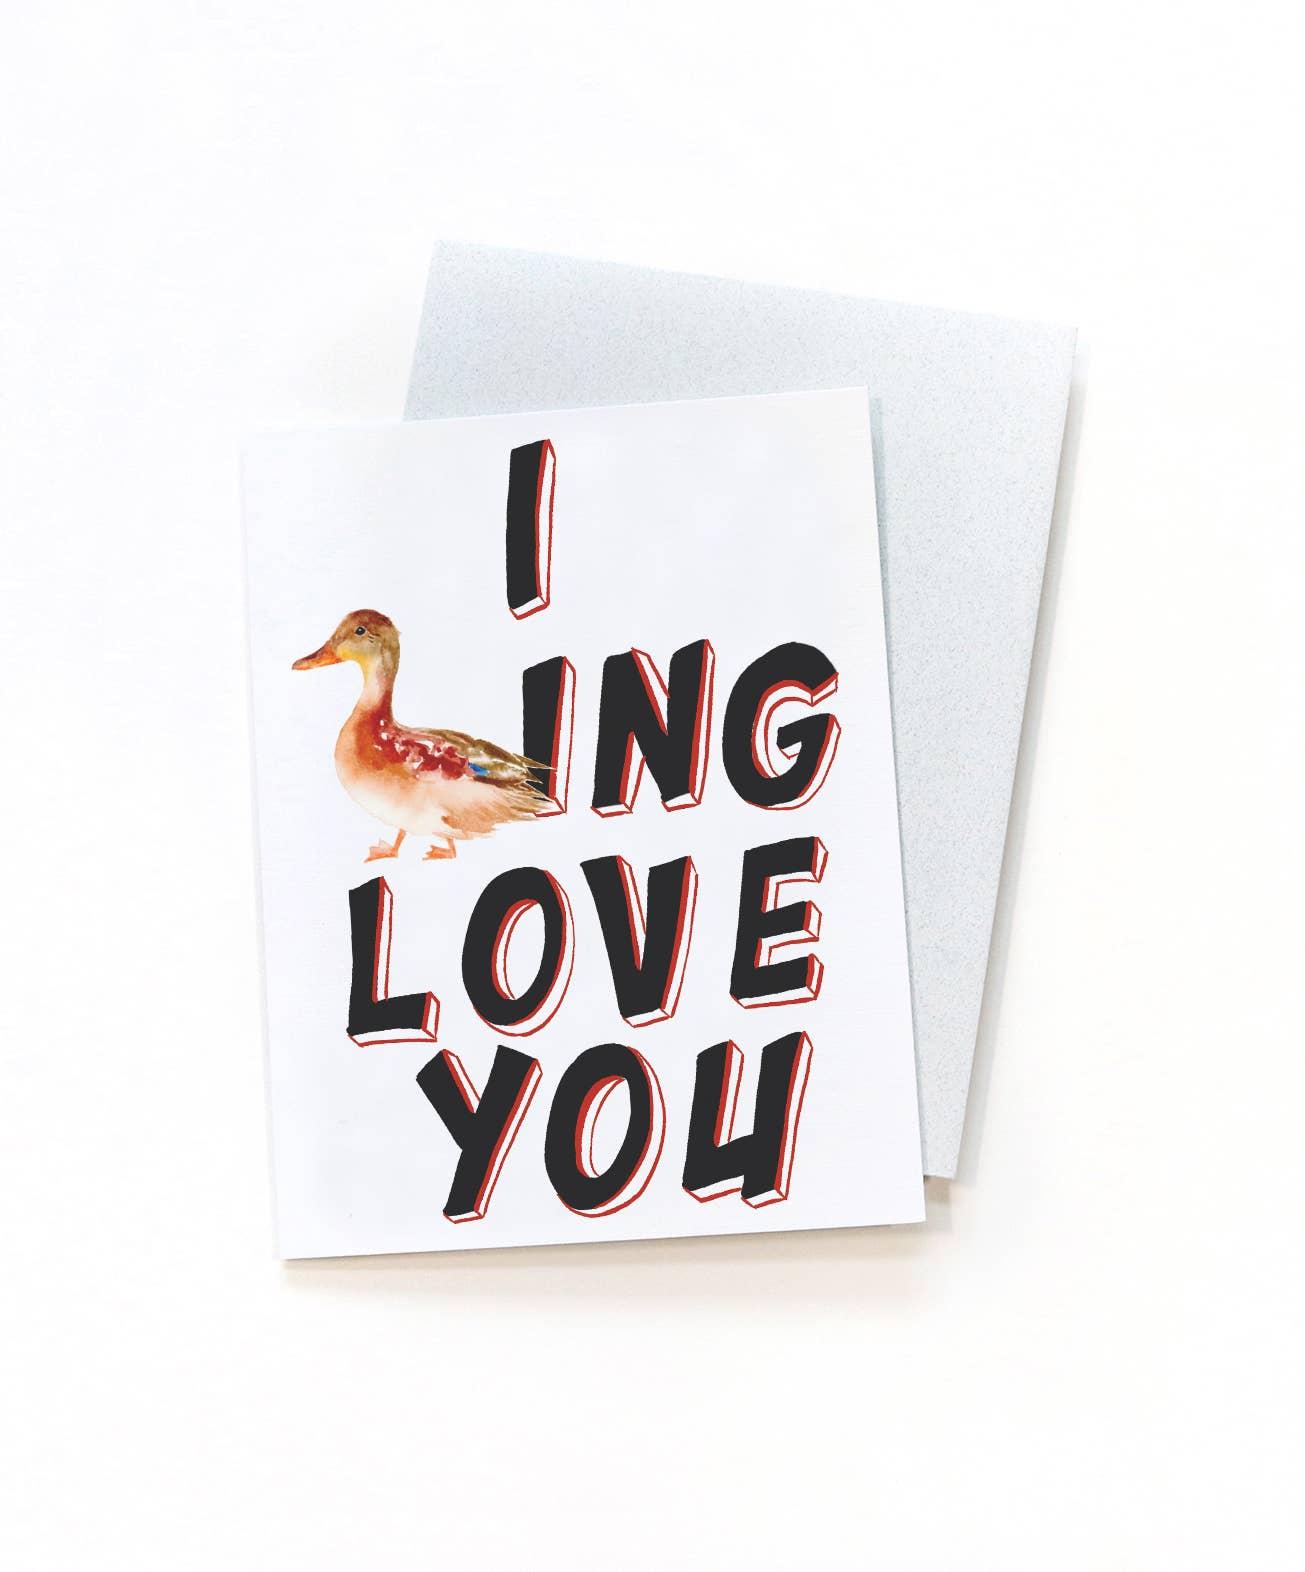 I Ducking Love You - Humor Greeting Card | Trada Marketplace